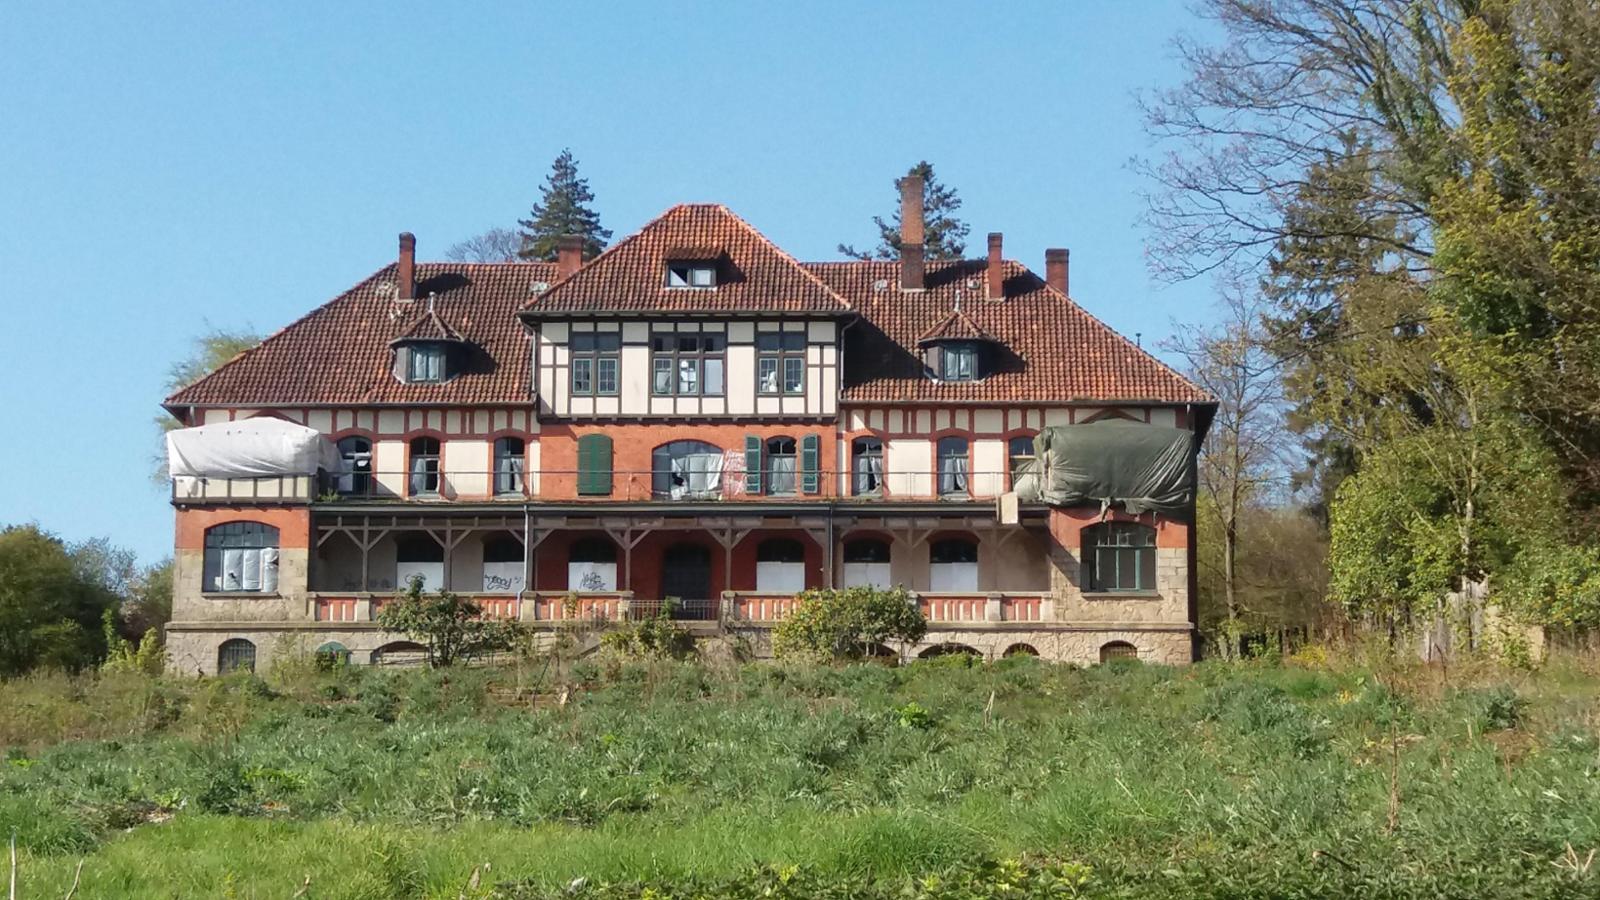 Anna-Forcke-Stift in Barsinghausen